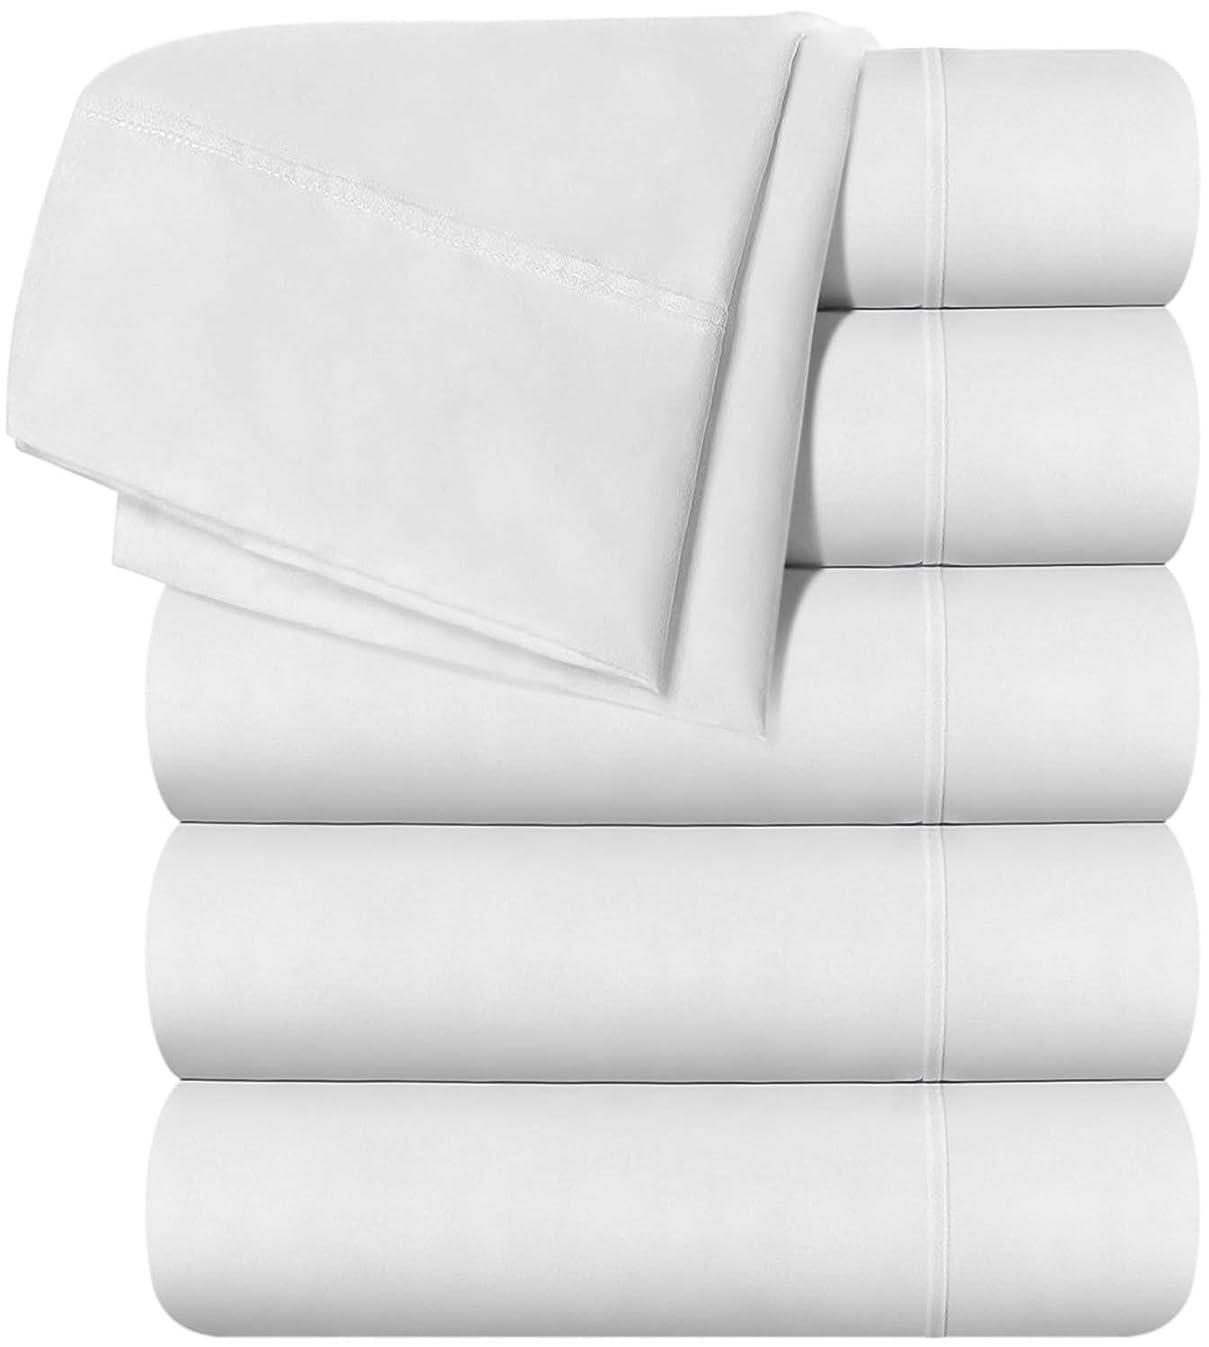 Utopia Bedding Queen Flat Sheet - White (6 Pack)